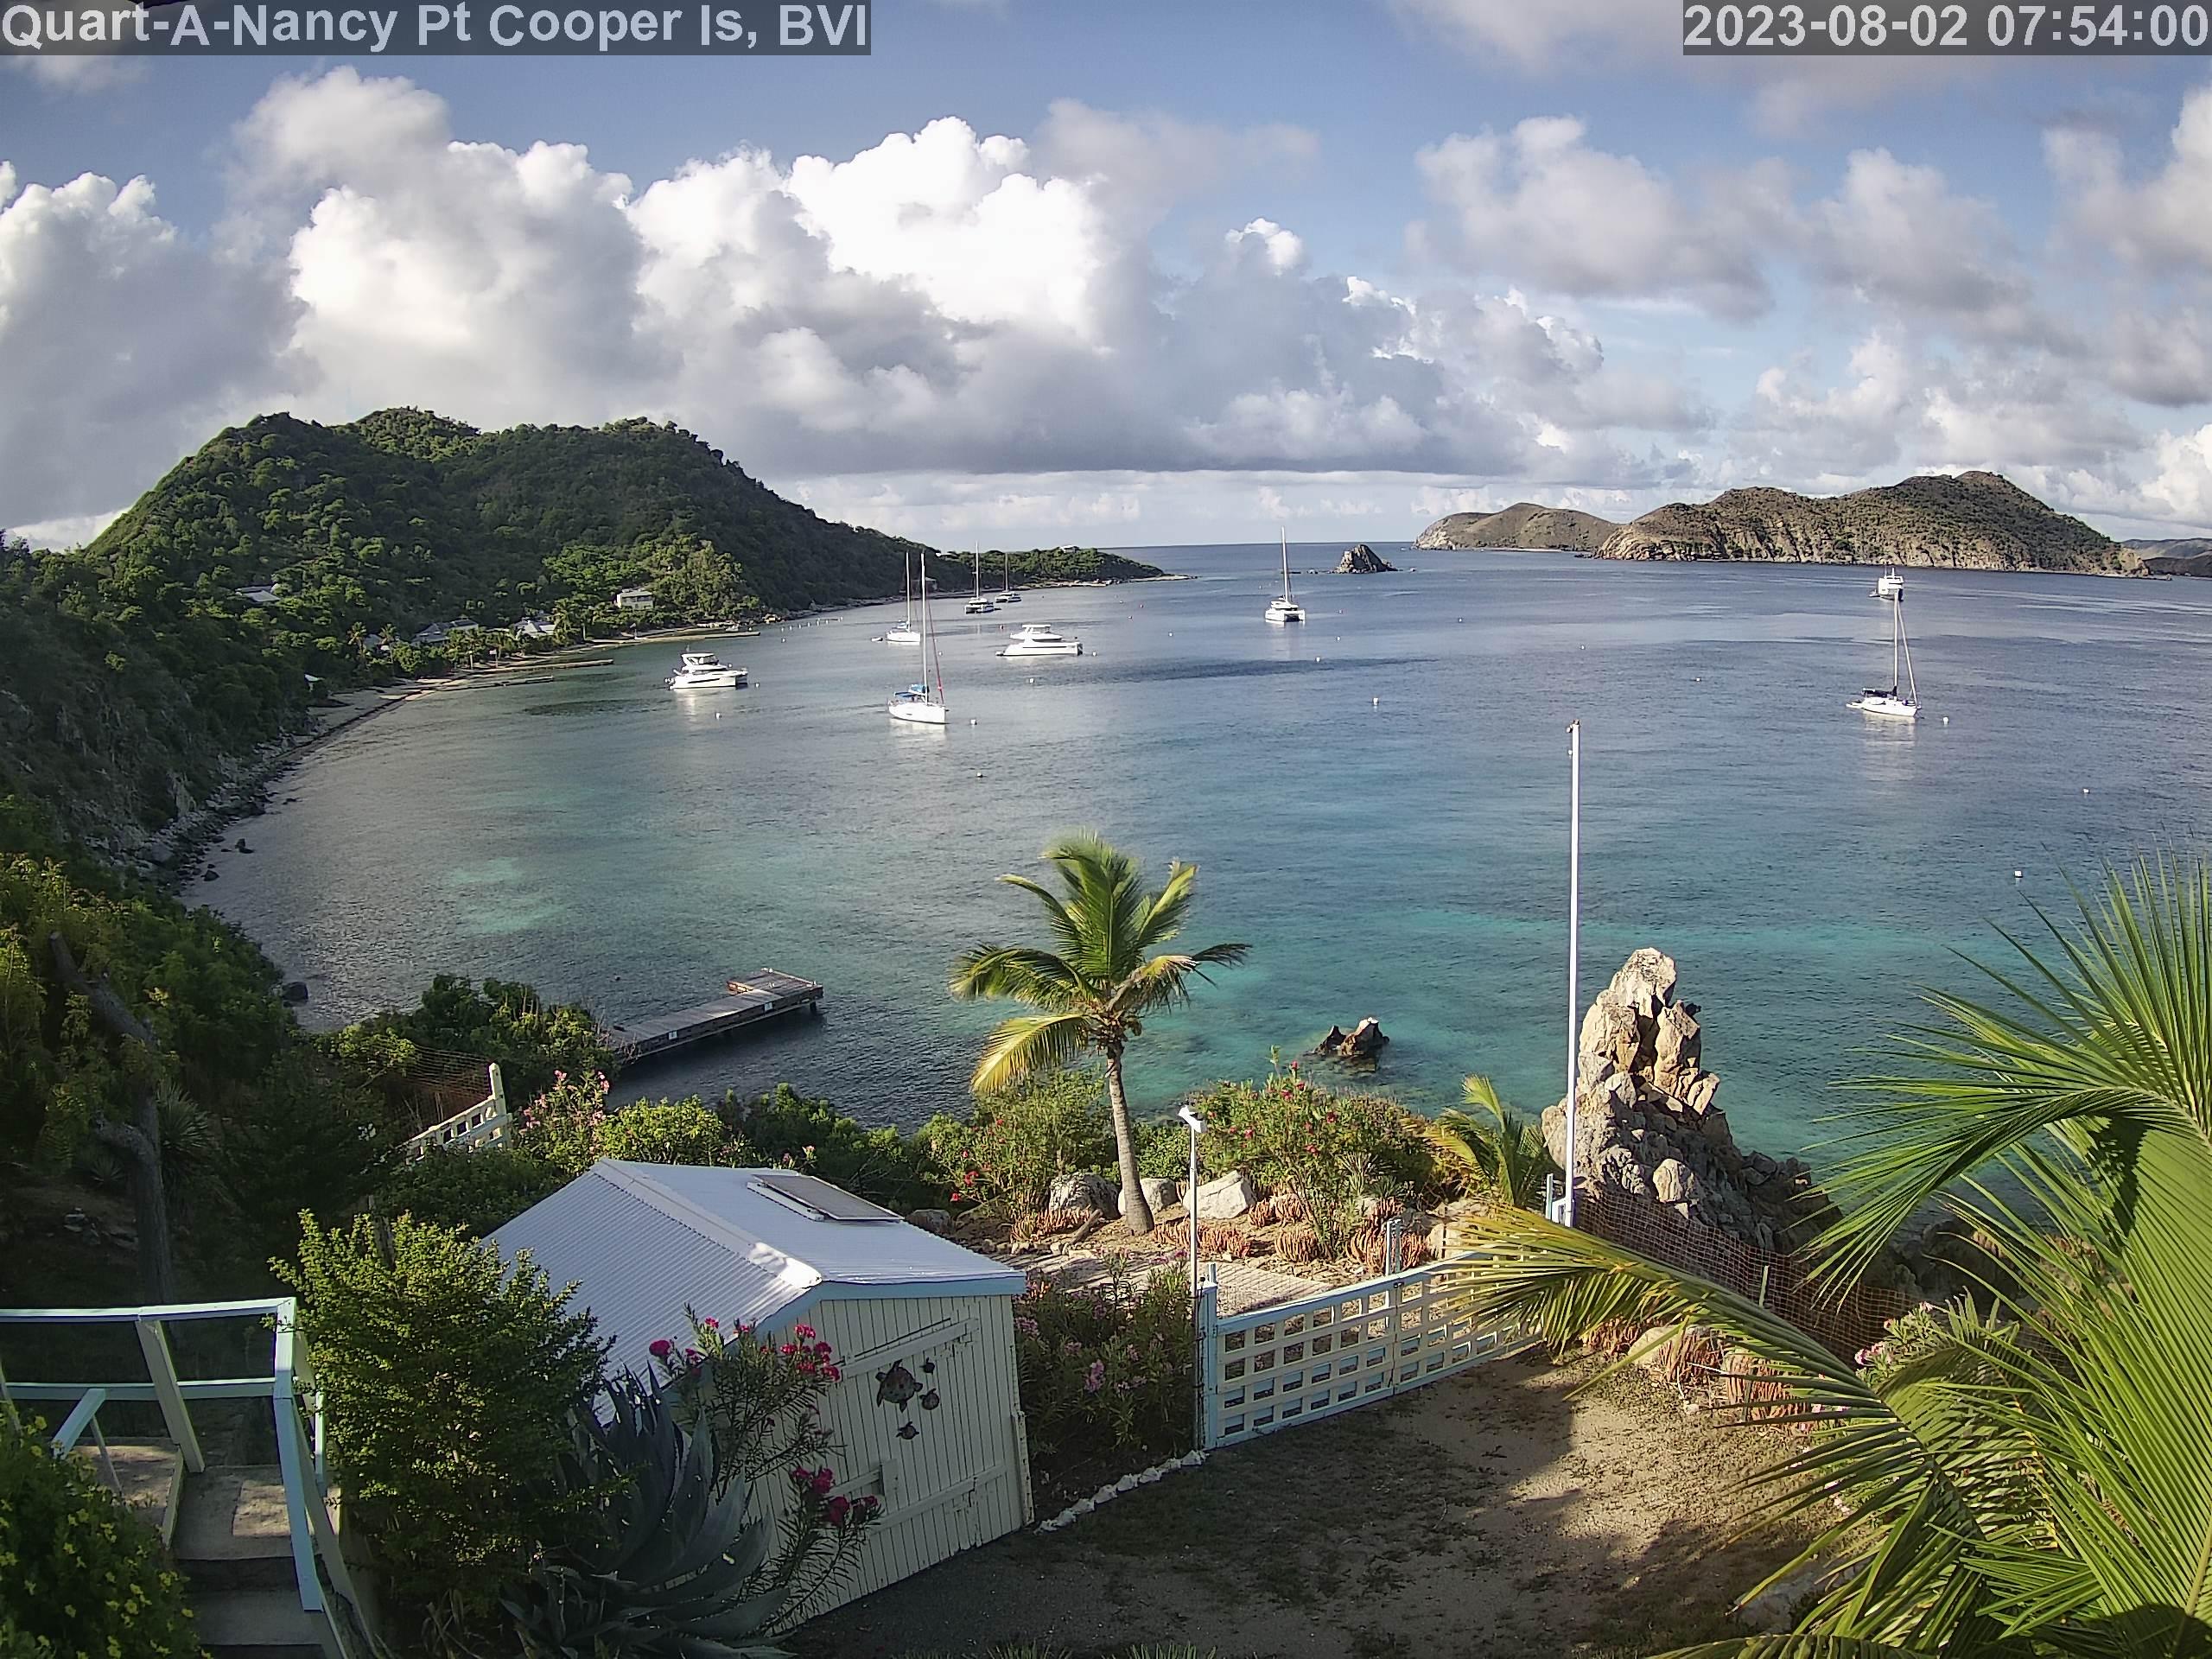 Marina Cay British Virgin Islands - ReservationsBVICom